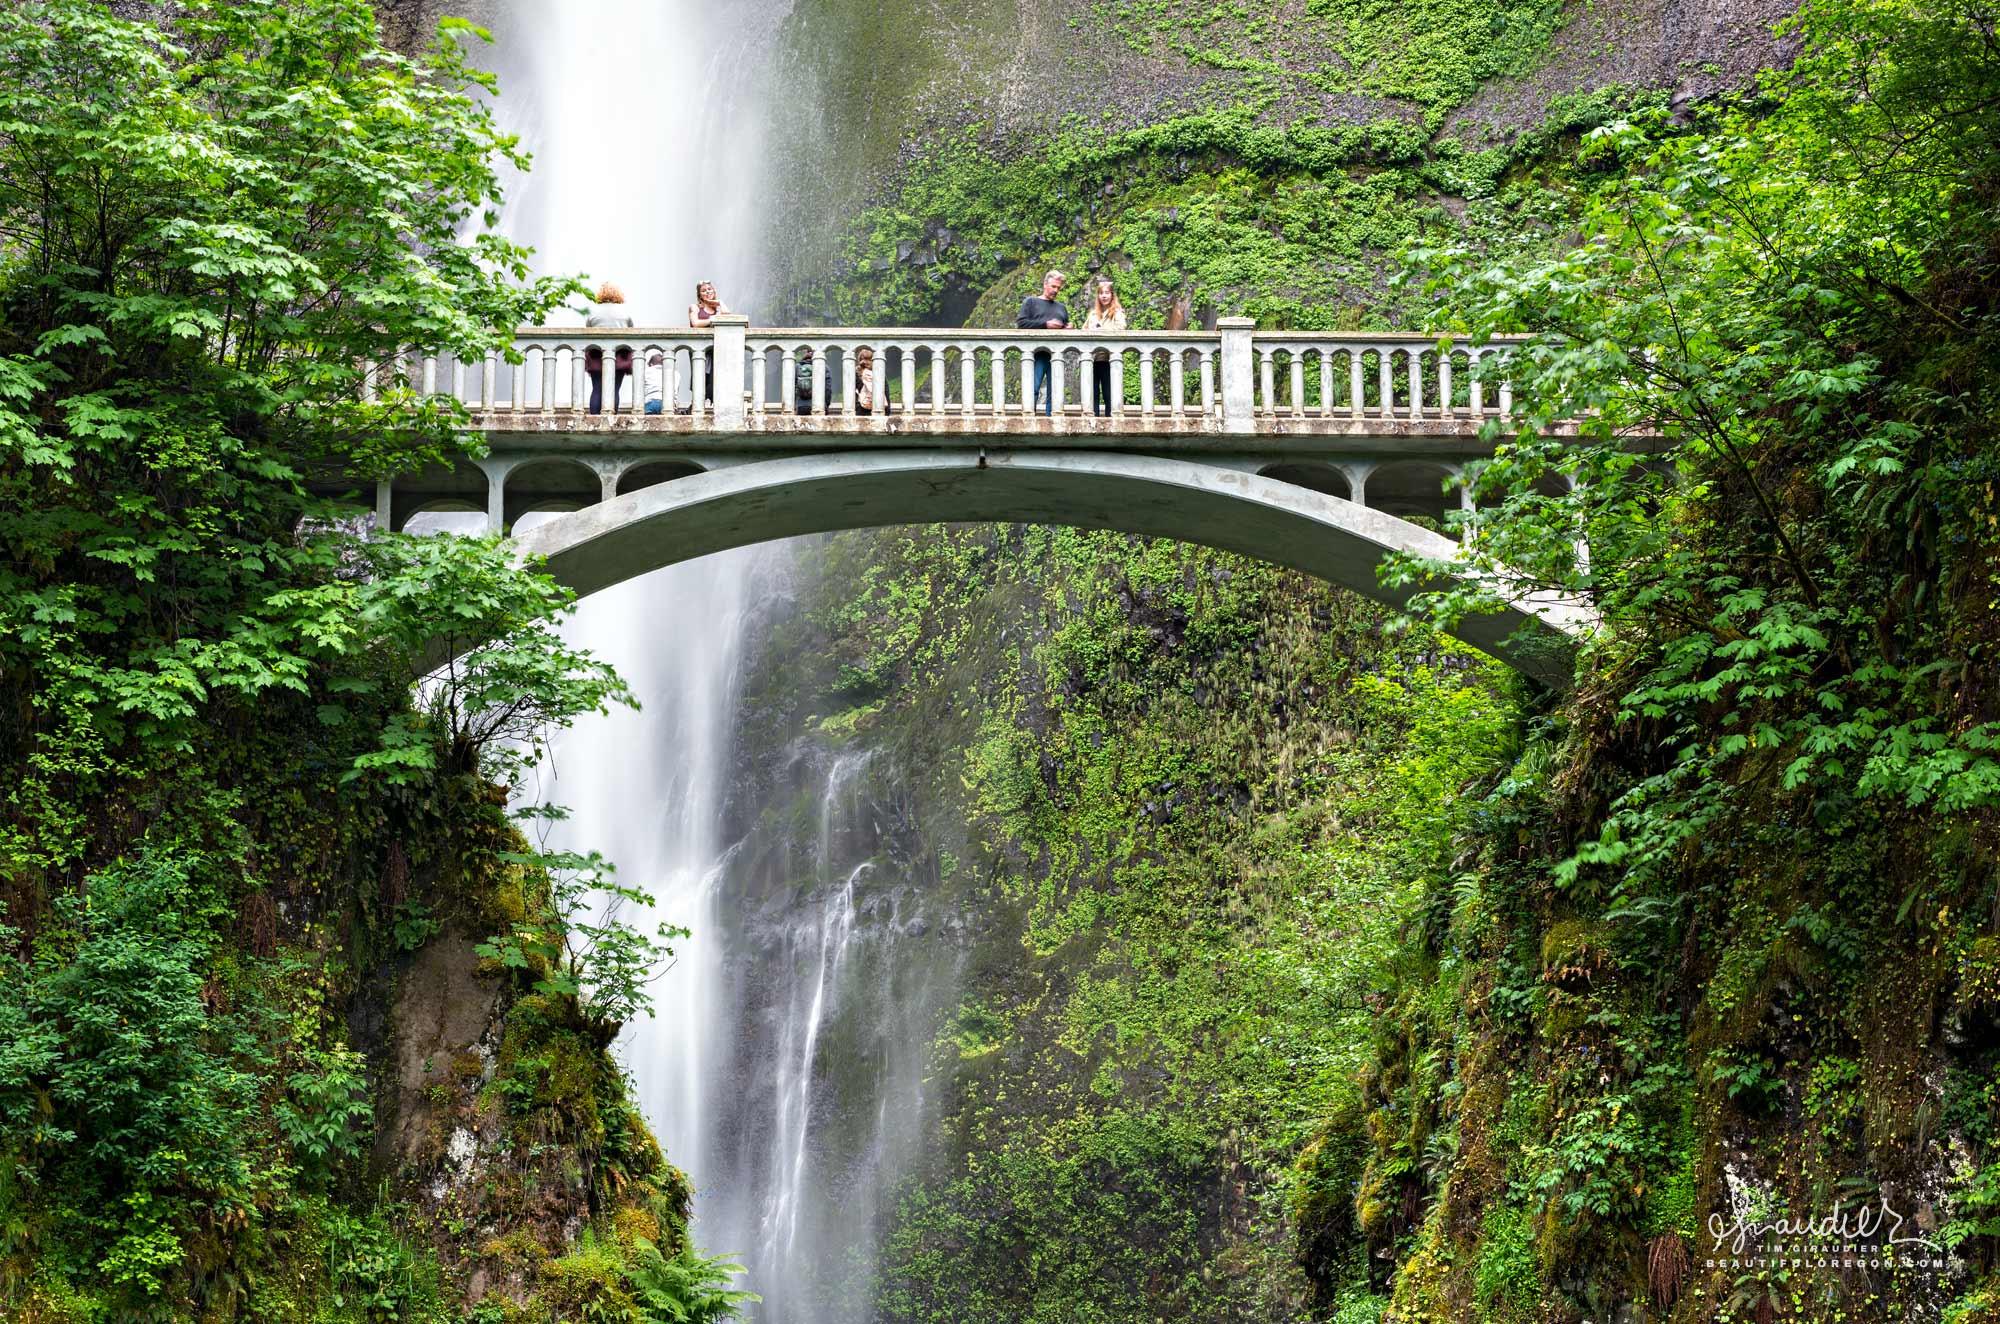 The historic Benson Bridge over Lower Multnomah Falls. Columbia River Gorge, Multnomah County, Oregon landscape photography.